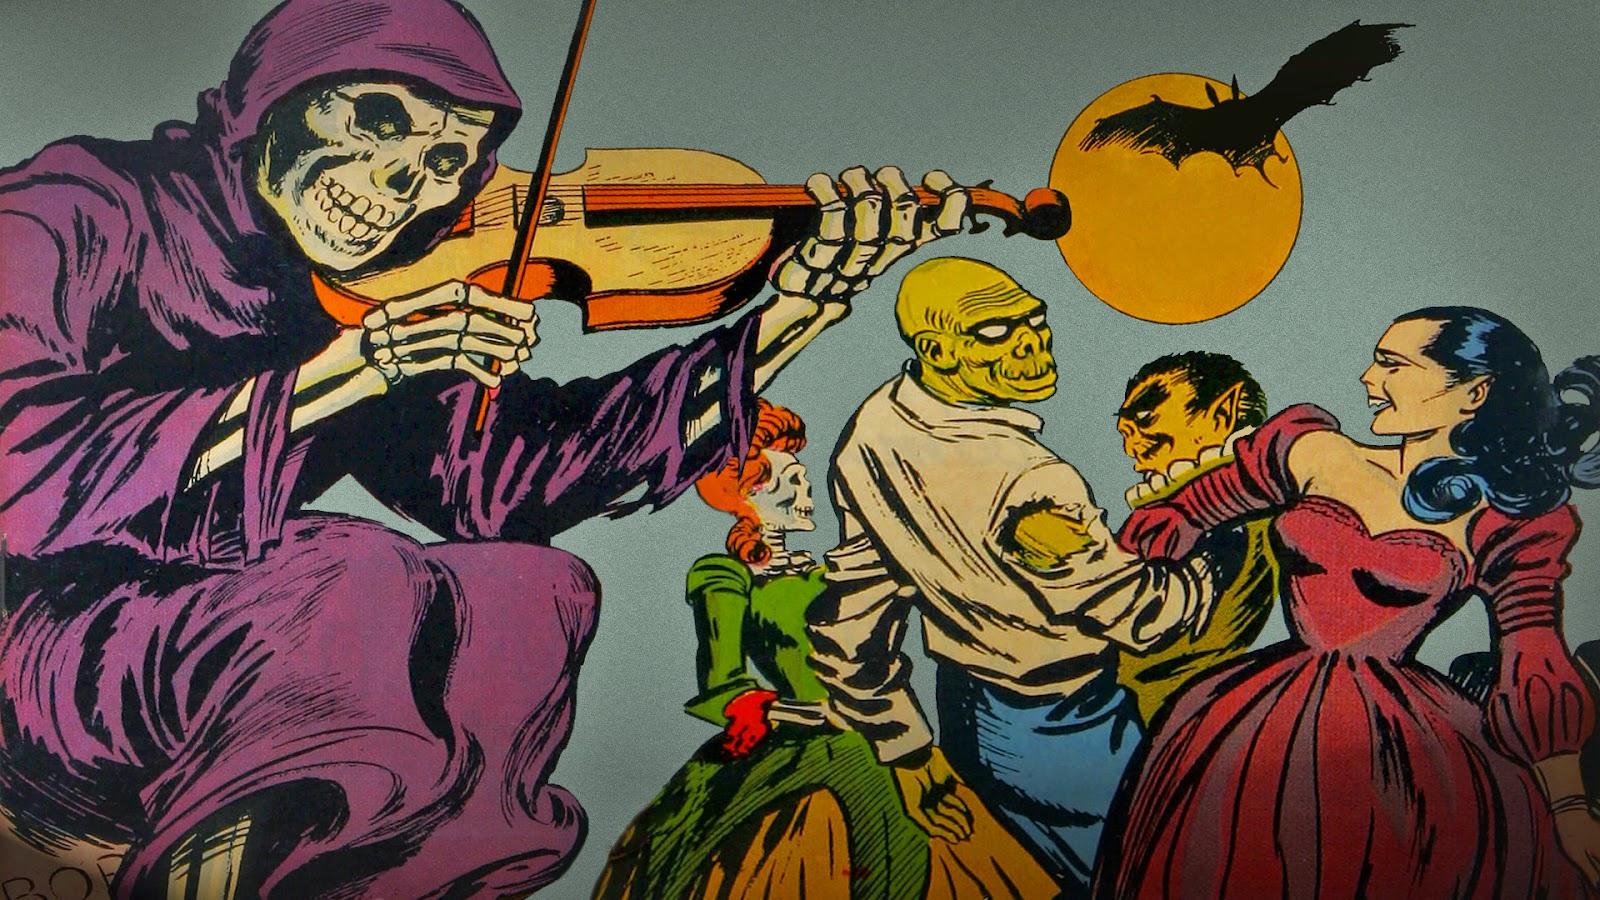 Halloween Wallpaper Skeleton Hand 1 Gadopost